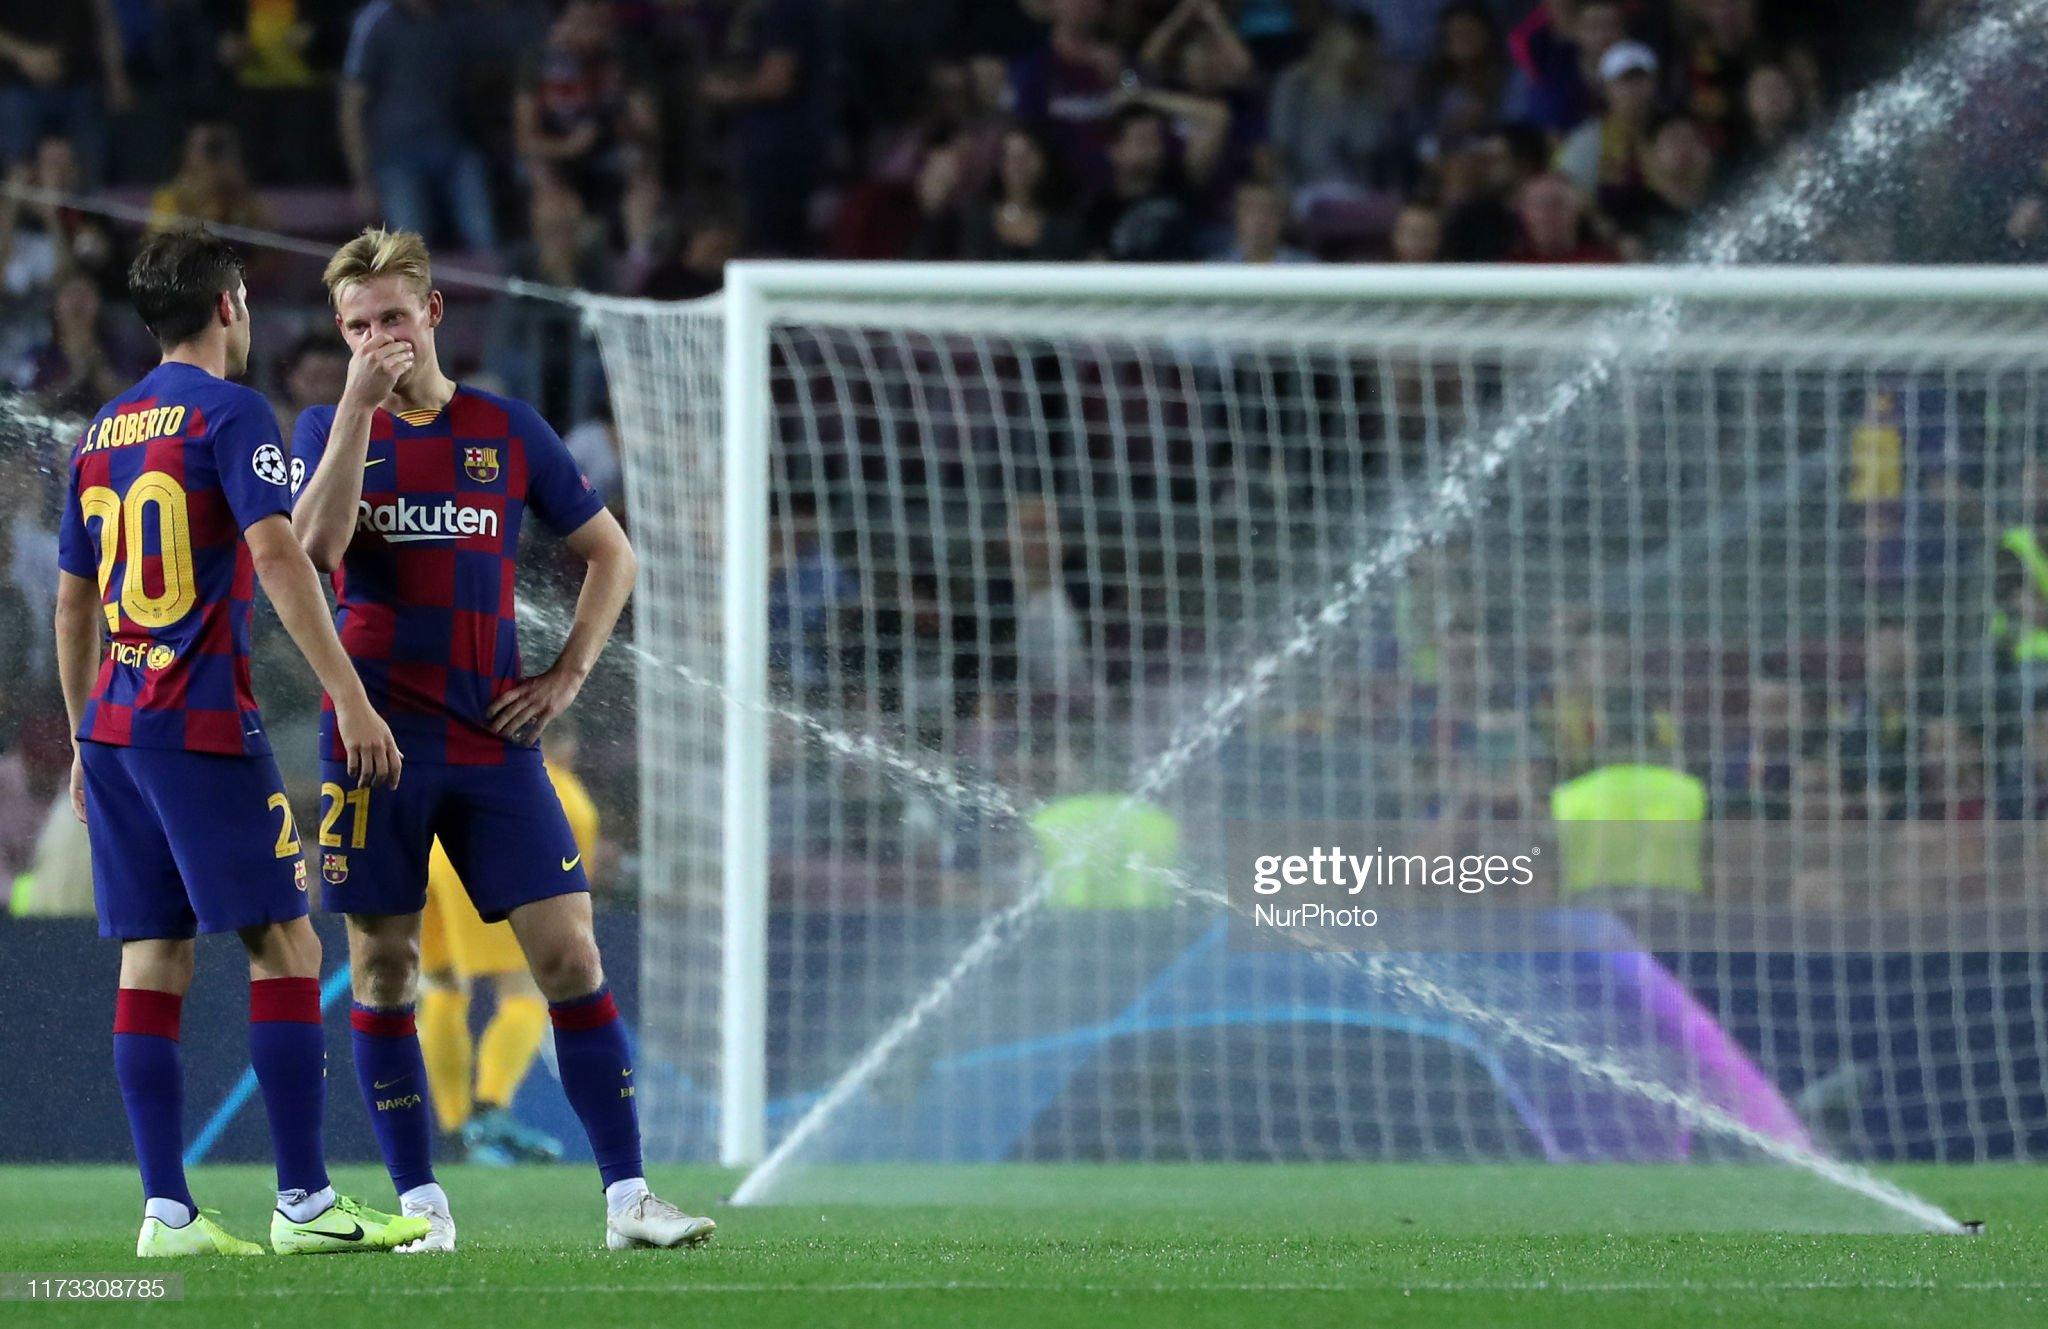 صور مباراة : برشلونة - إنتر 2-1 ( 02-10-2019 )  Sergi-roberto-and-frankie-de-jong-during-the-match-between-fc-inter-picture-id1173308785?s=2048x2048